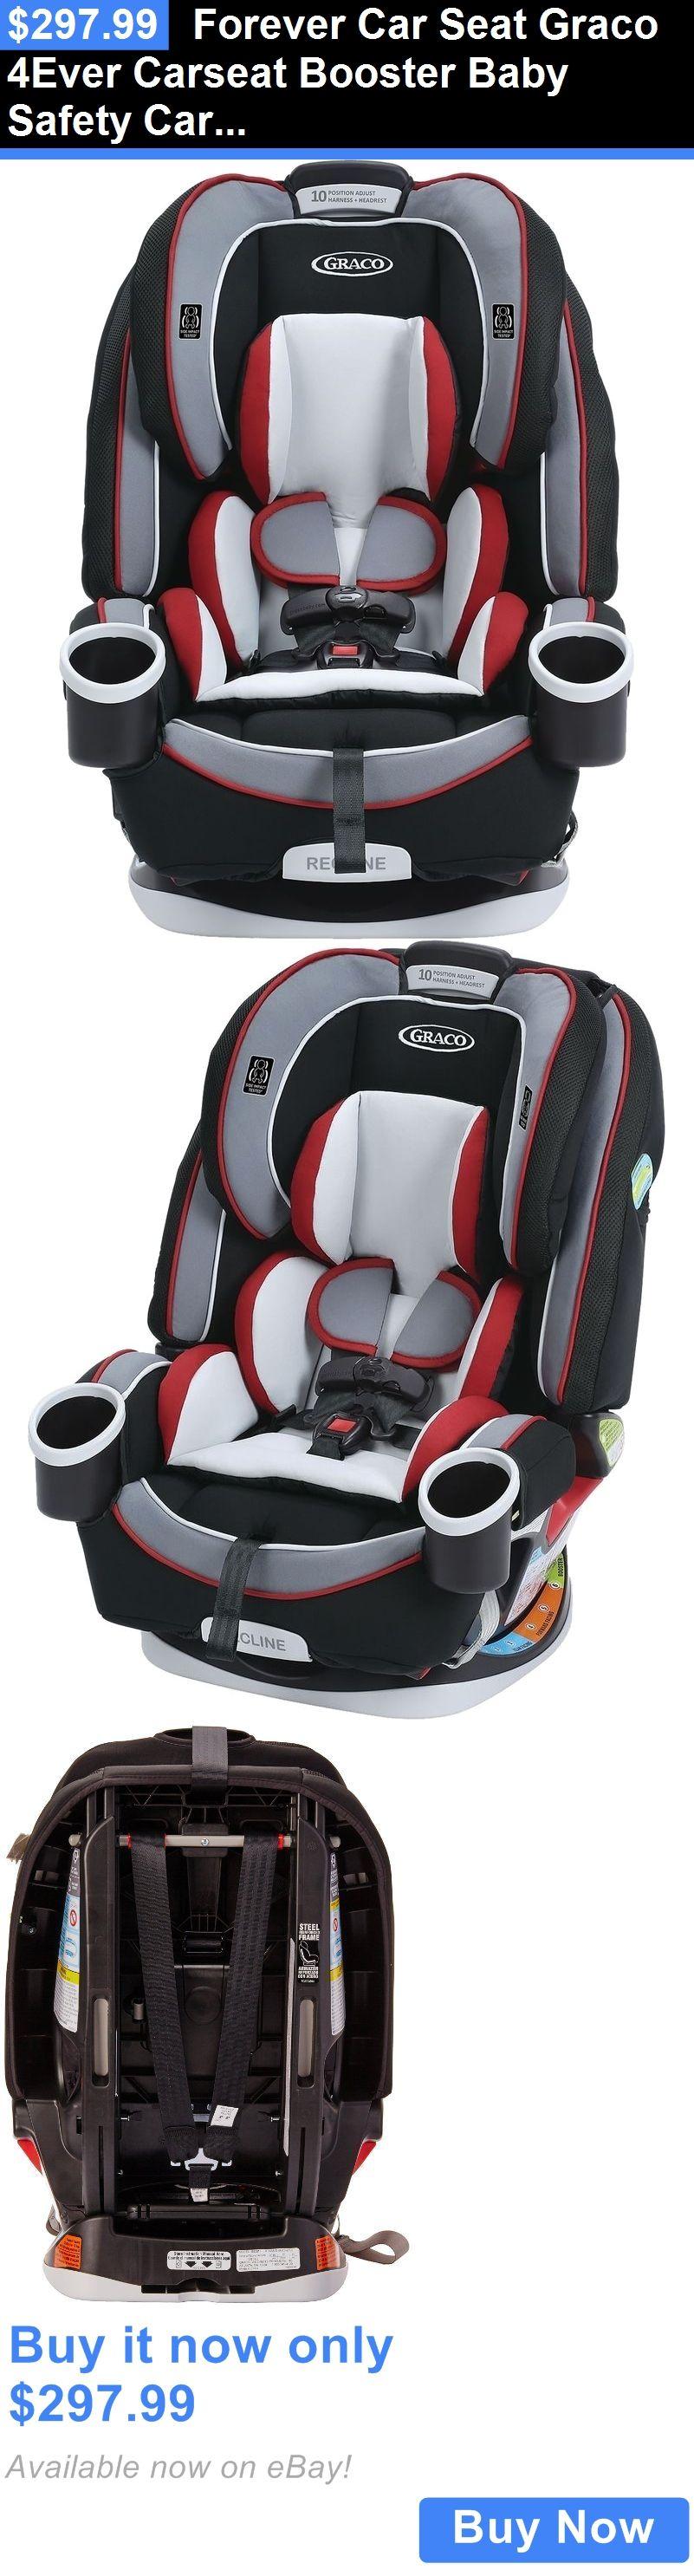 Pin by Nana Semonick on Car seat Baby car seats, Car